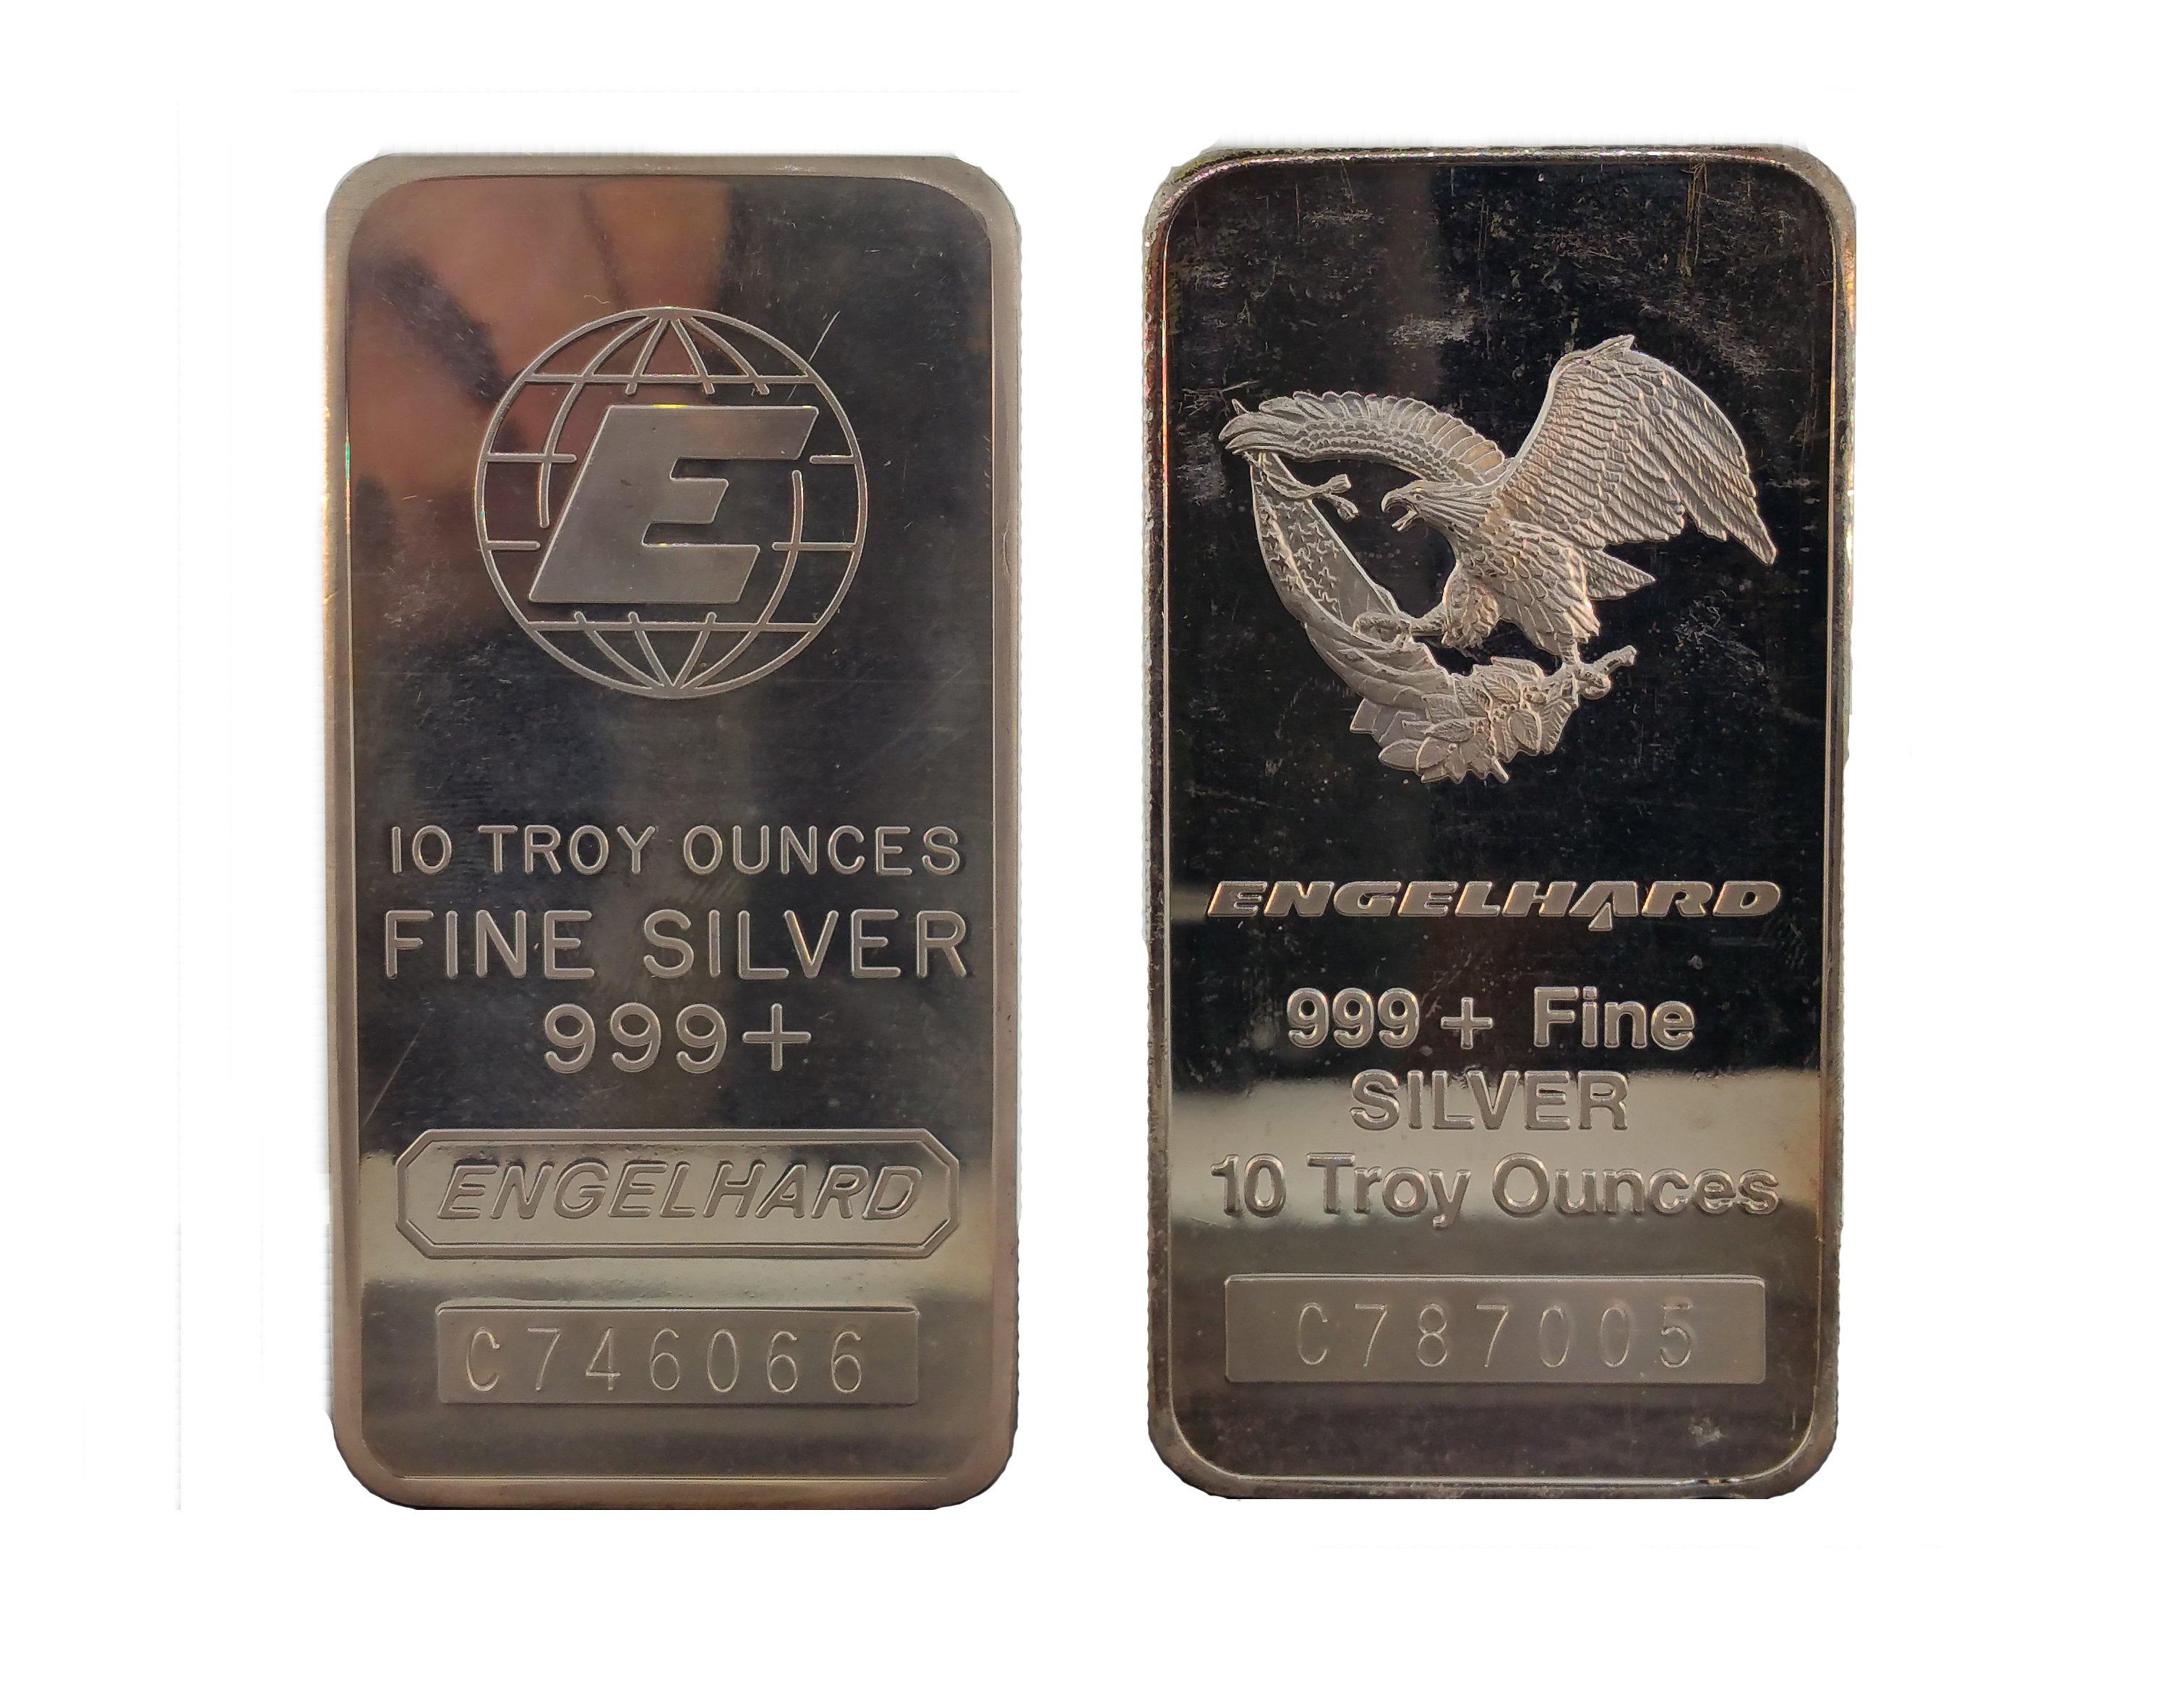 Engelhard 10 Ounce Silver Bar Sell Coins Houston 713 521 1748 Liberty Walking 1oz